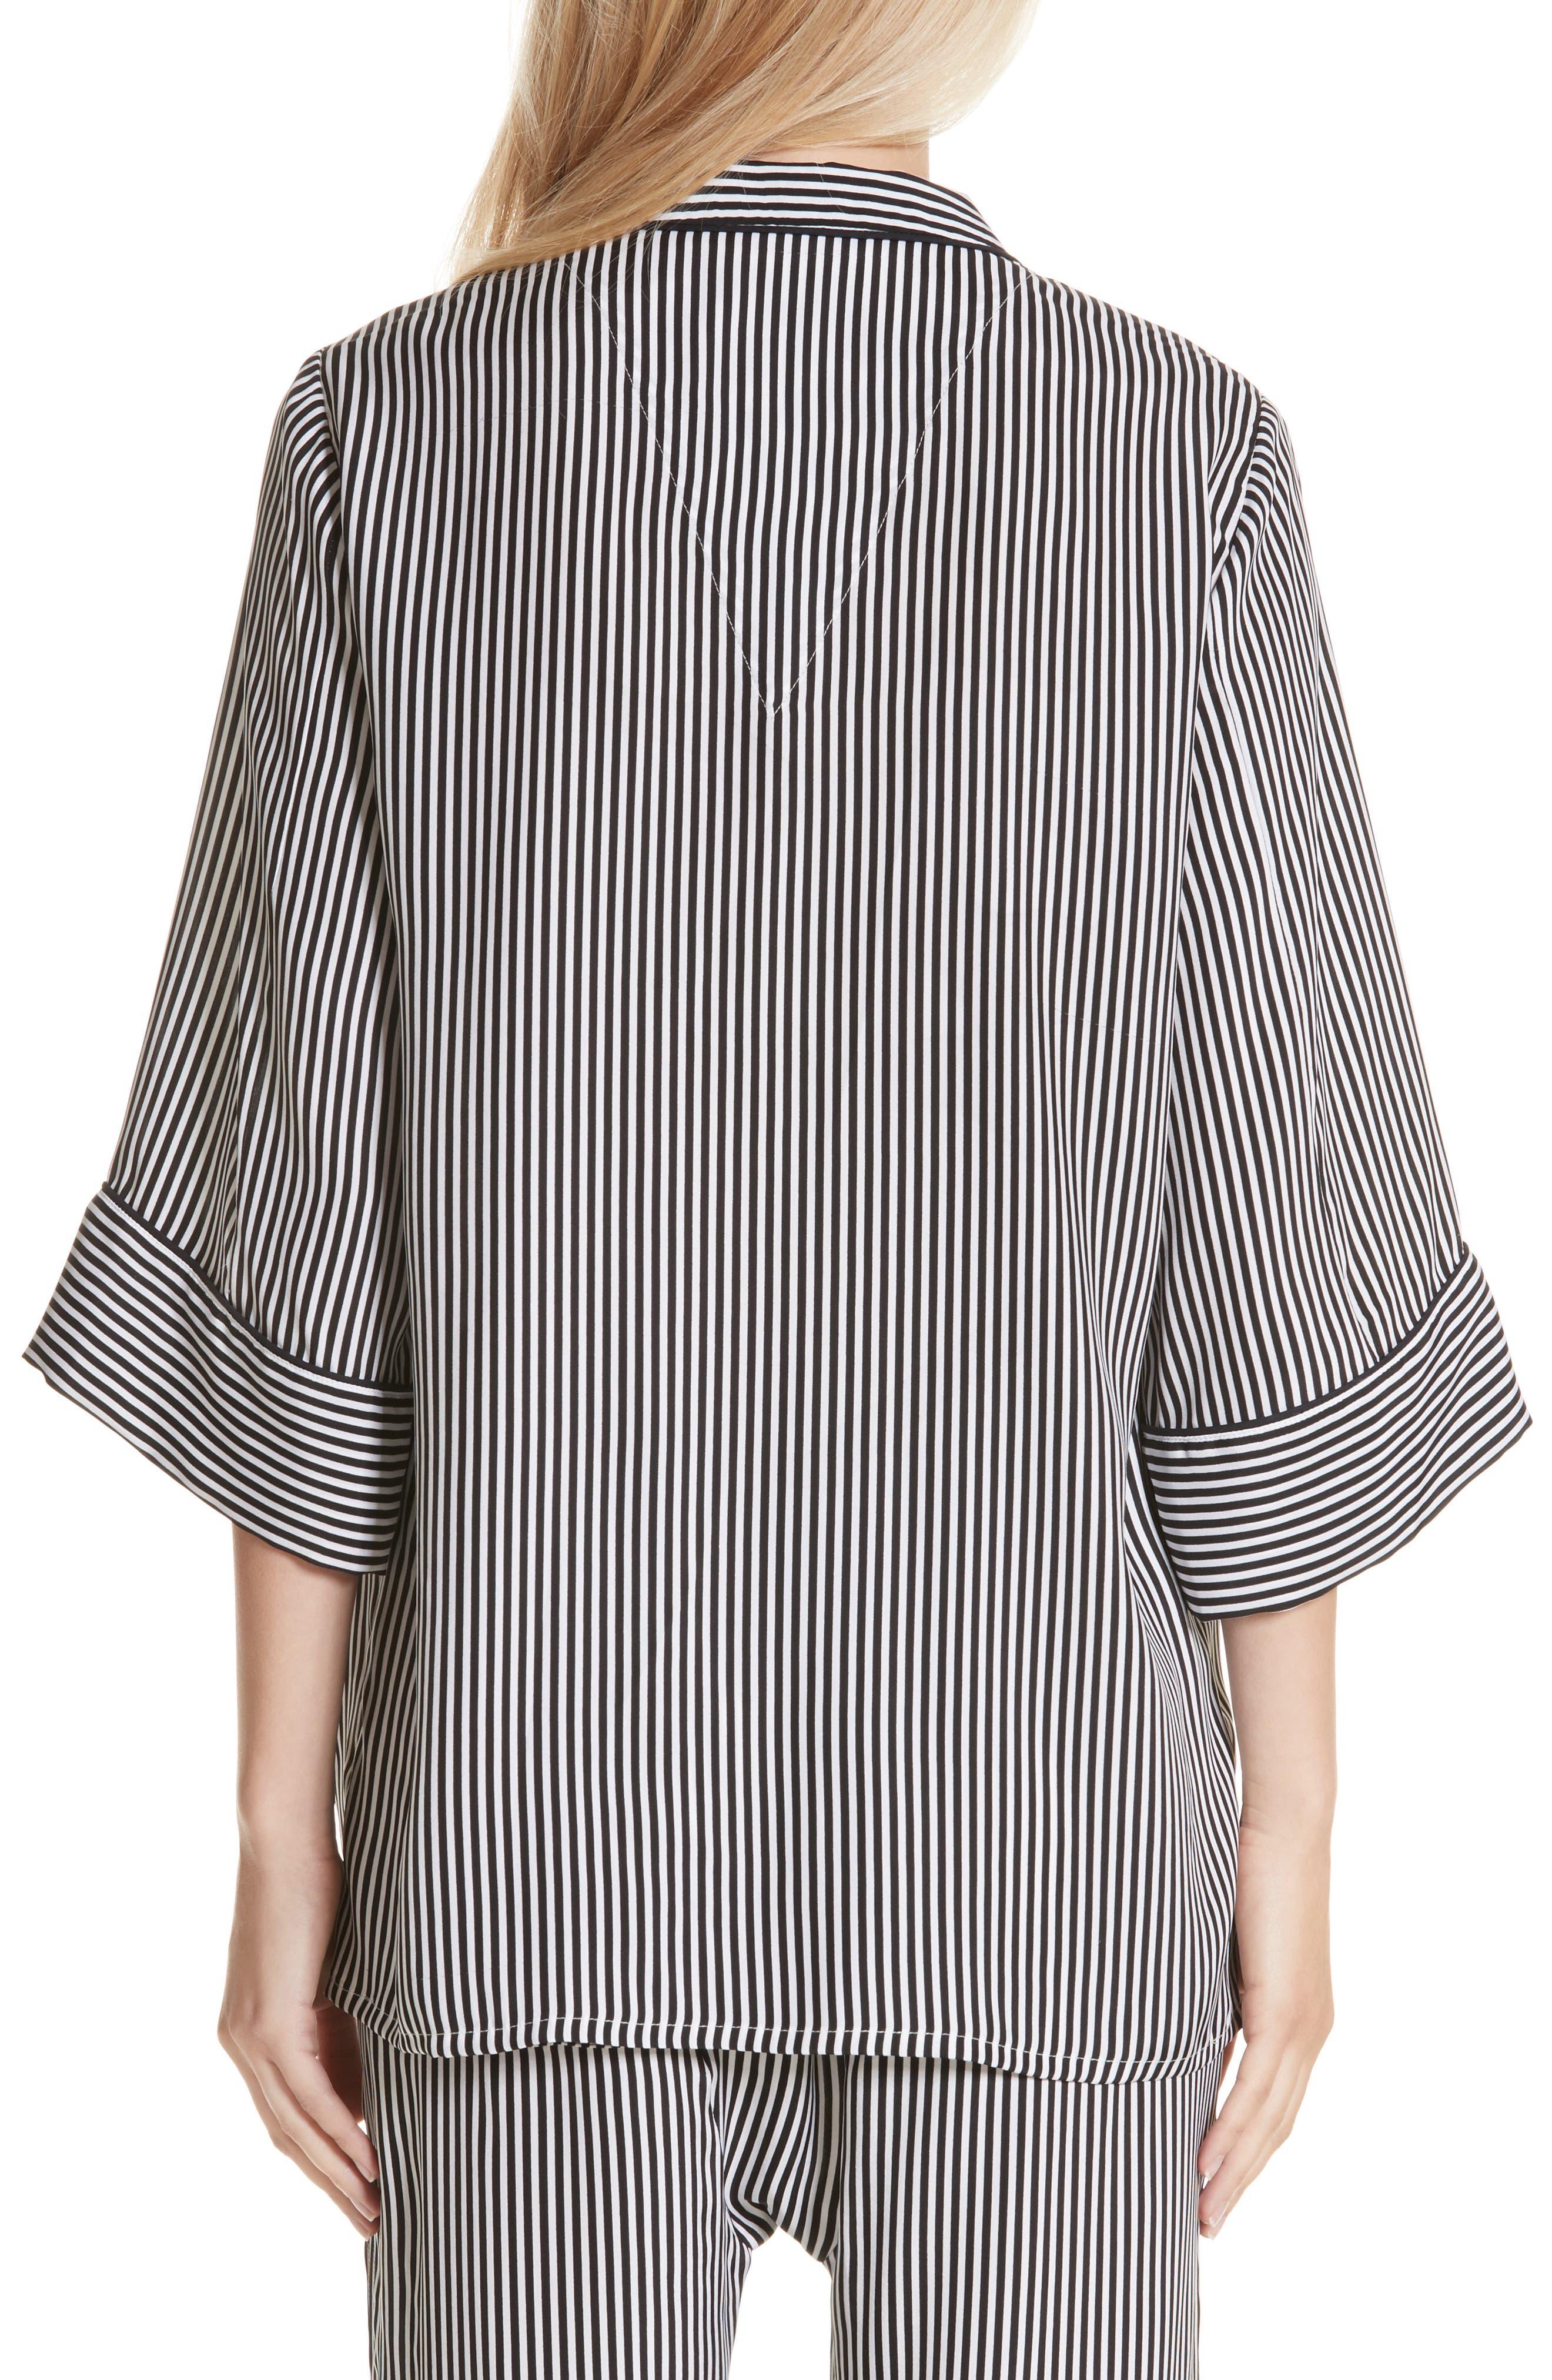 Pencil Stripe Silk Sleeper Shirt,                             Alternate thumbnail 5, color,                             Pencil Stripe